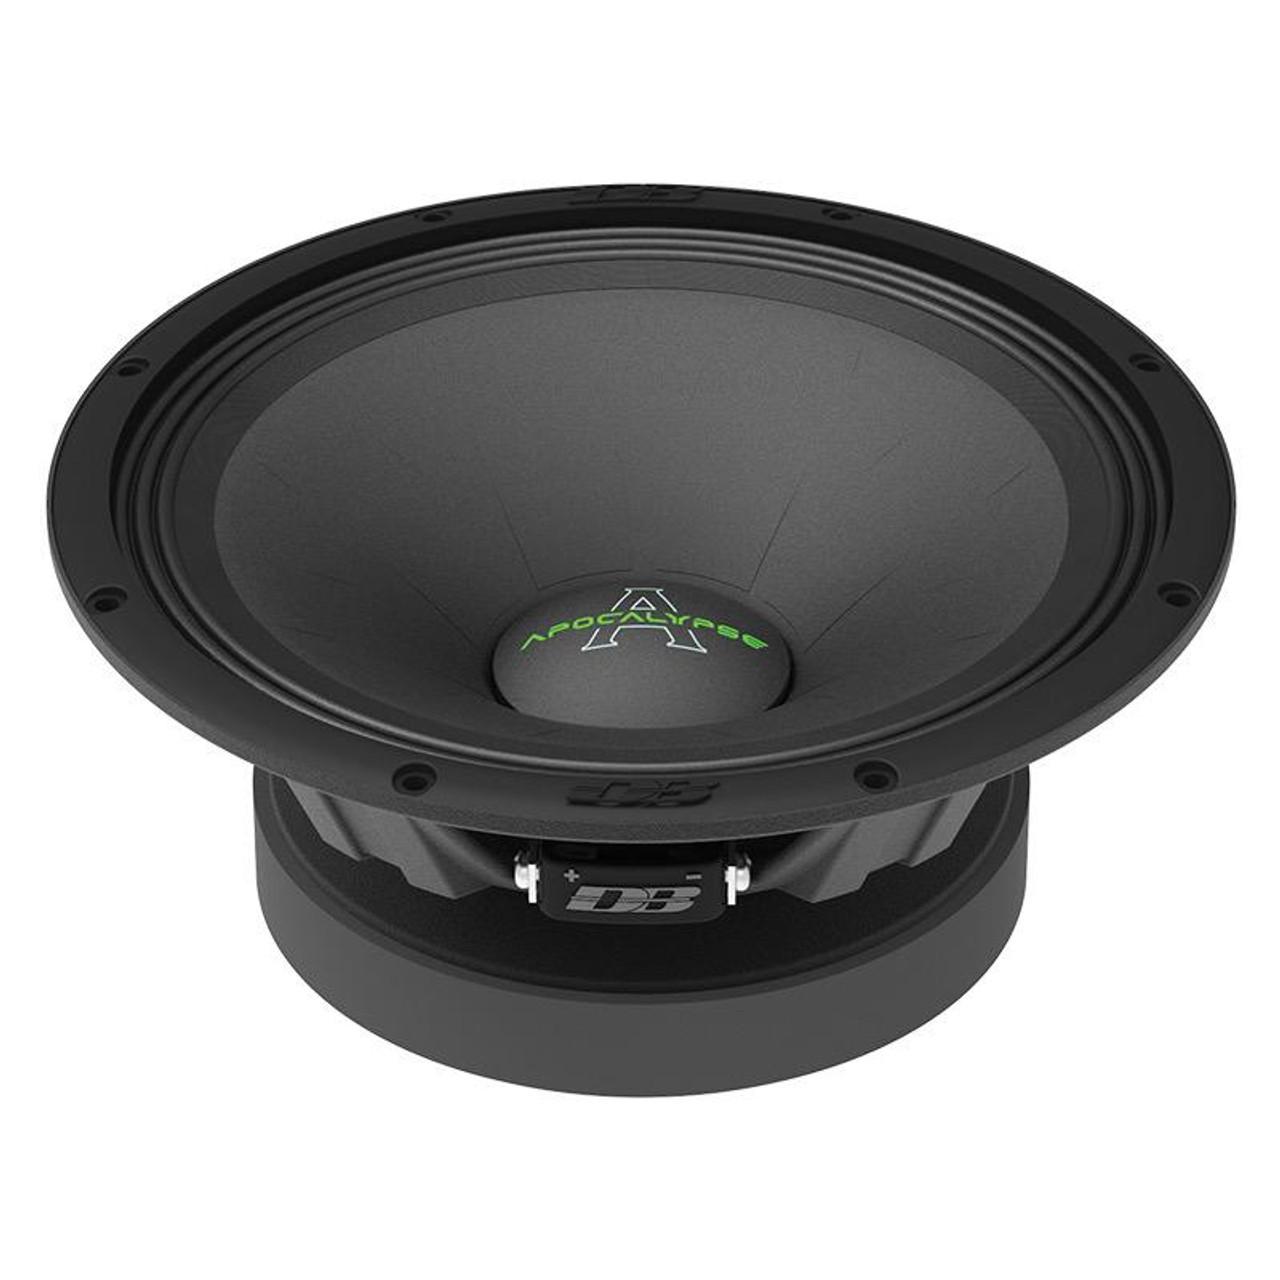 "Deaf Bonce Apocalypse AP-M81A   8"" Mid-Range Speakers (Pair)"